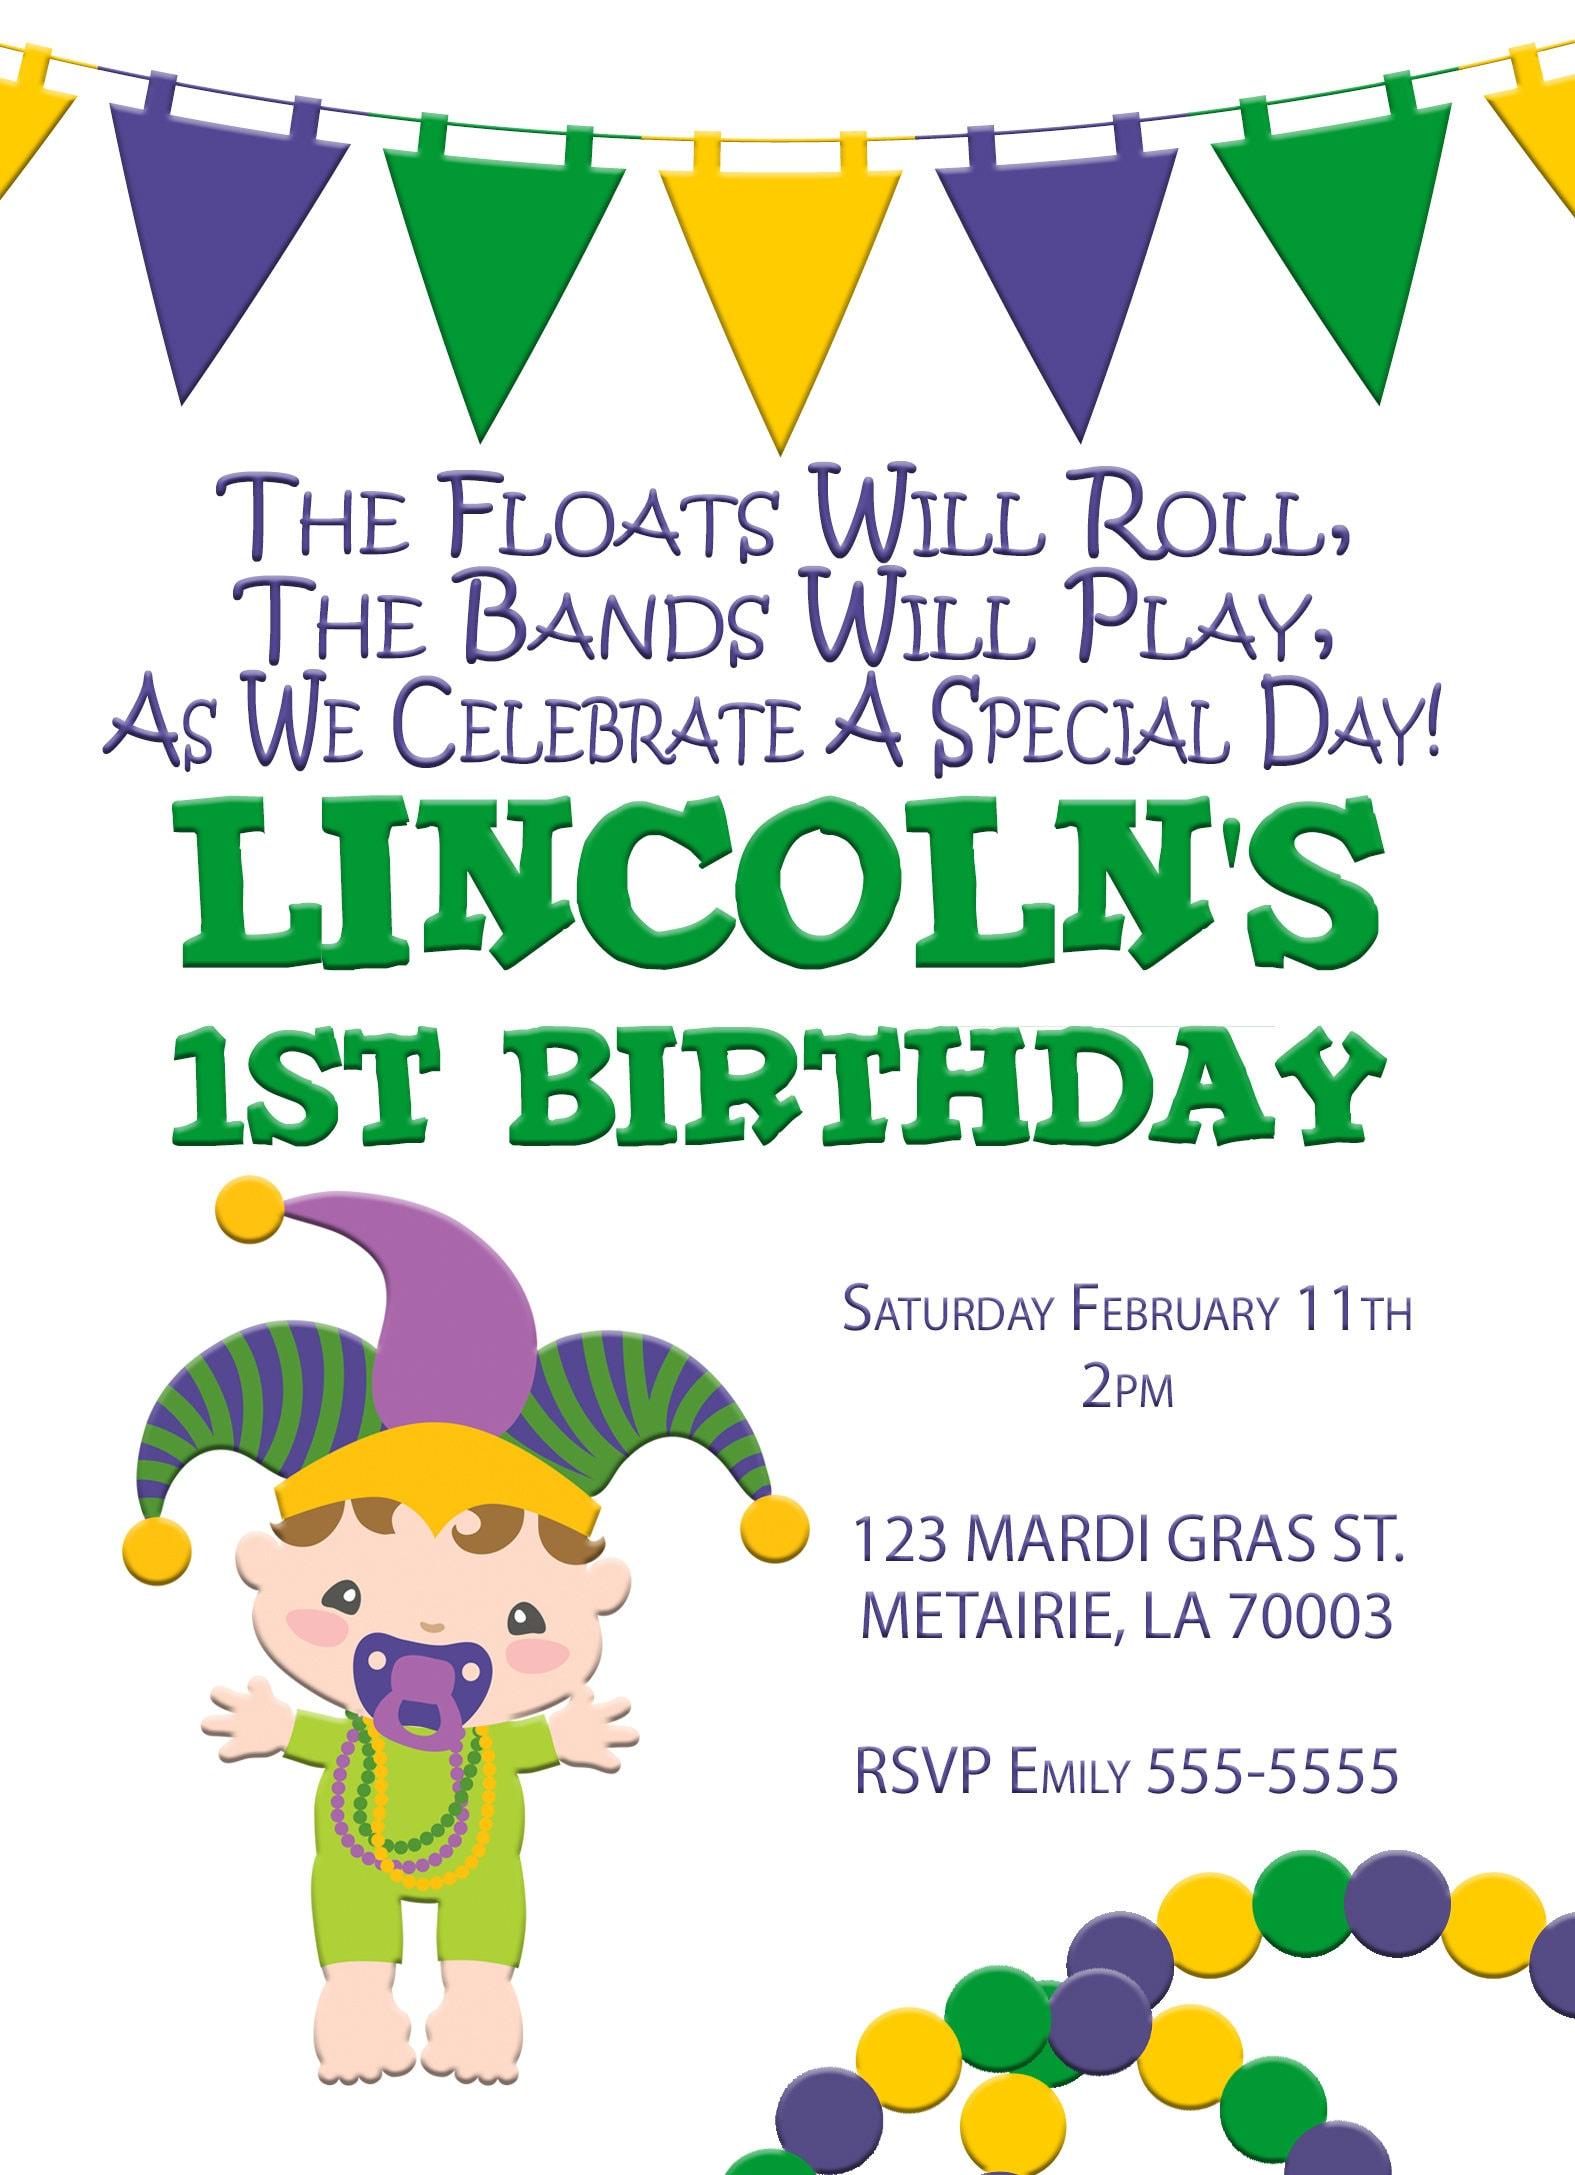 Mardi Gras Birthday Party Invitation, Mardi Gras Party, Parade ...